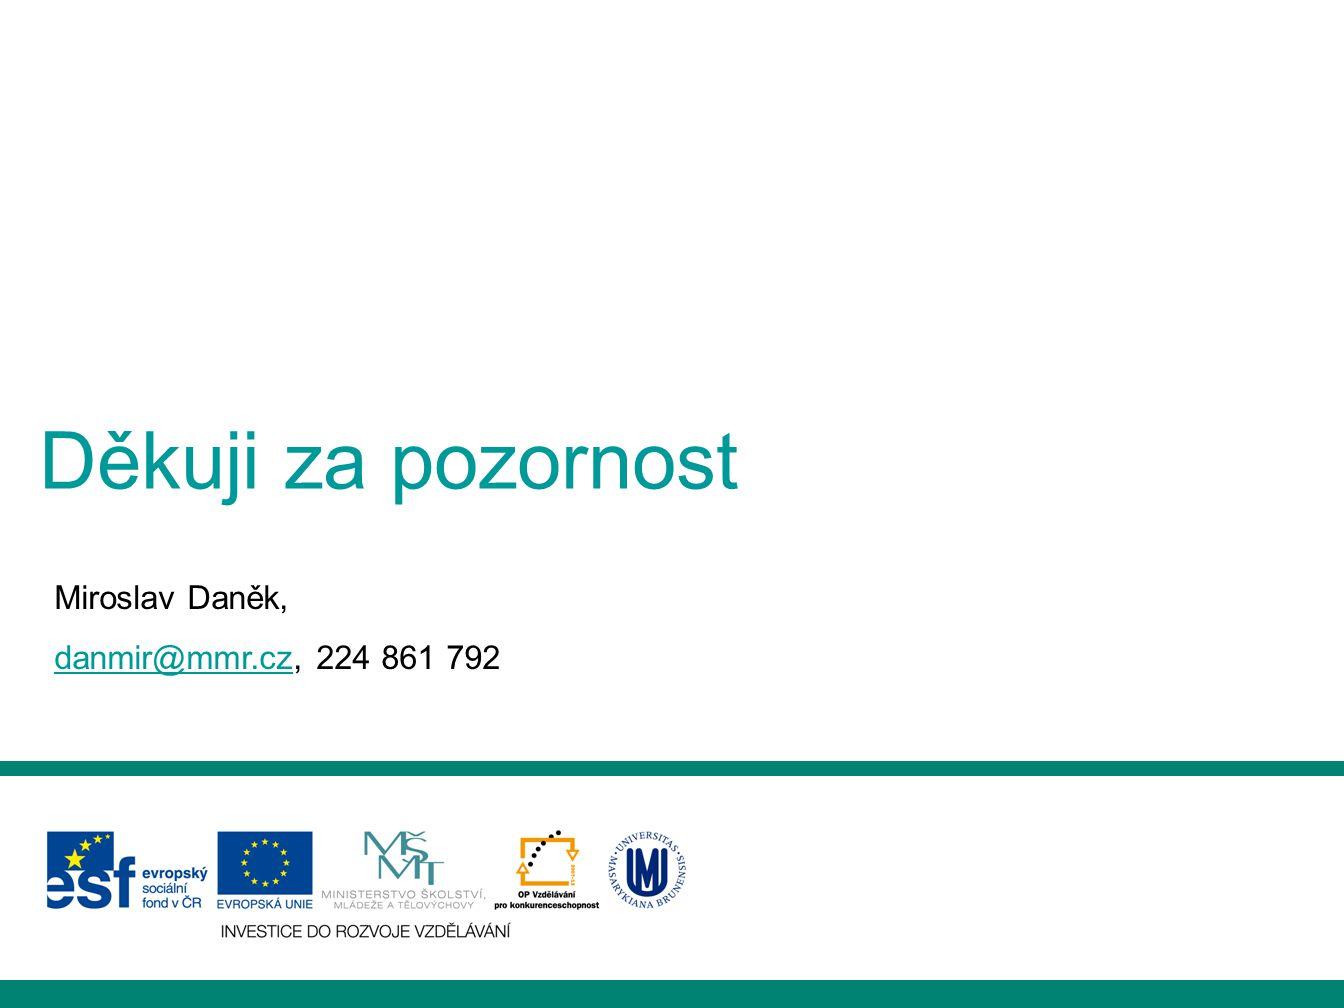 Děkuji za pozornost Miroslav Daněk, danmir@mmr.cz, 224 861 792